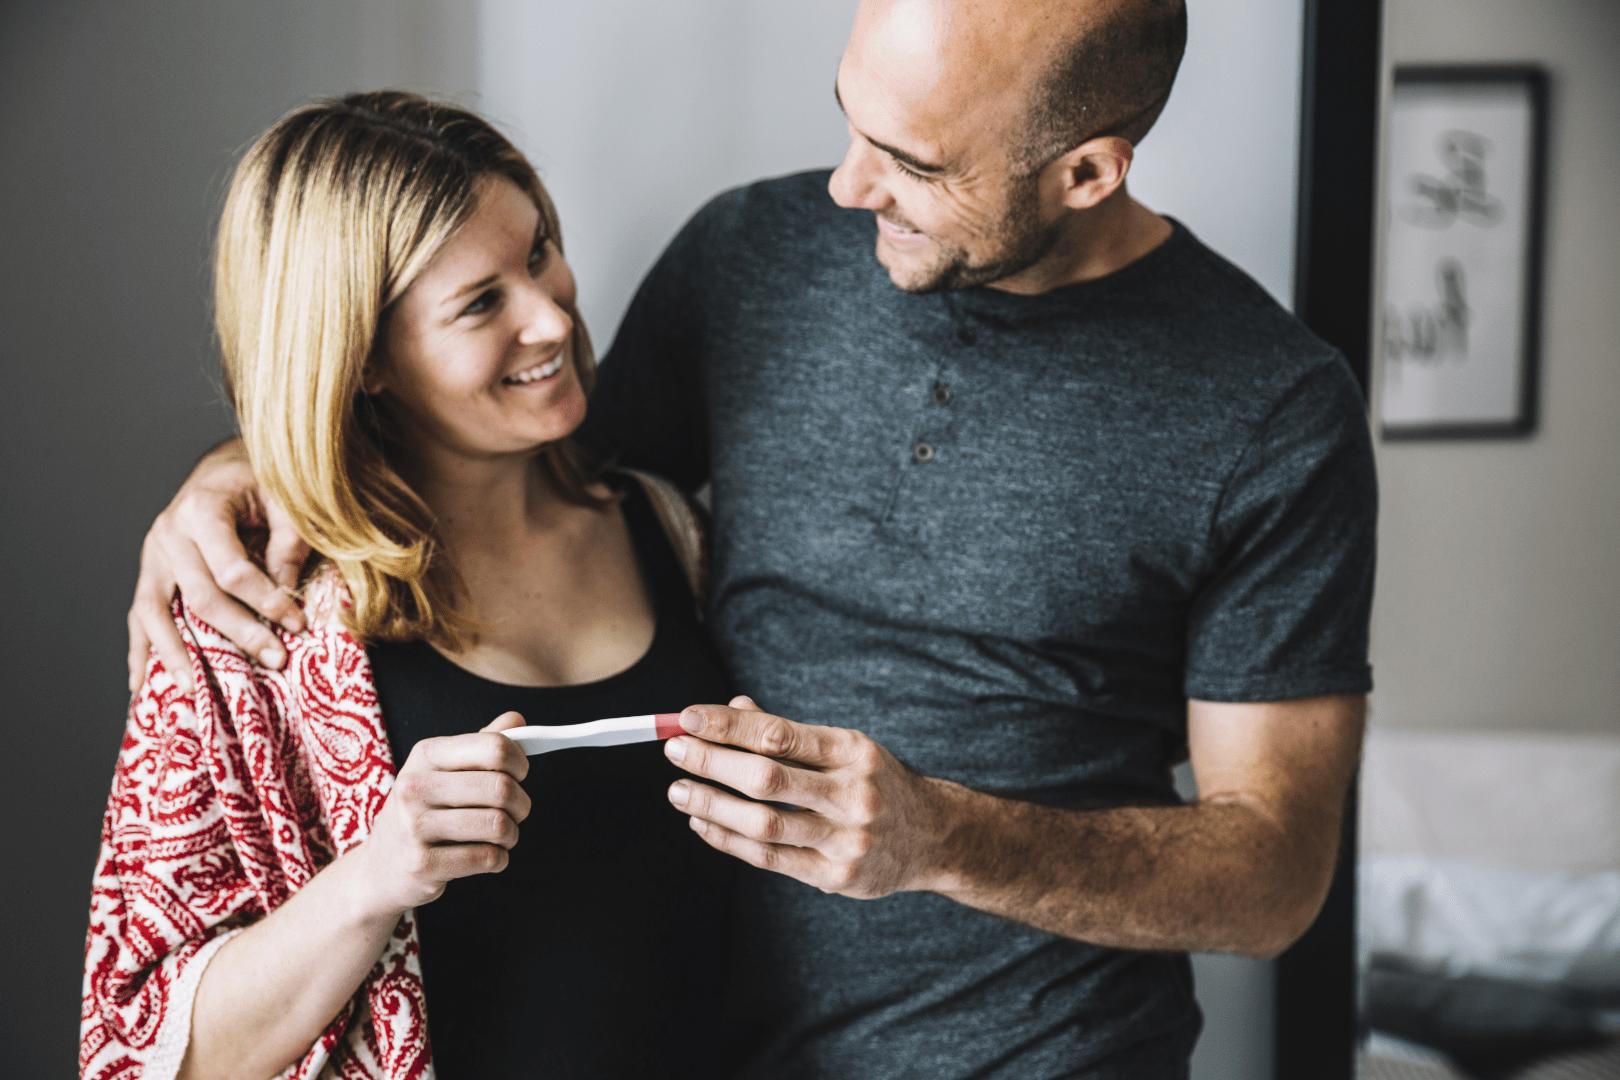 gravidez casal segurando um teste de gravidez